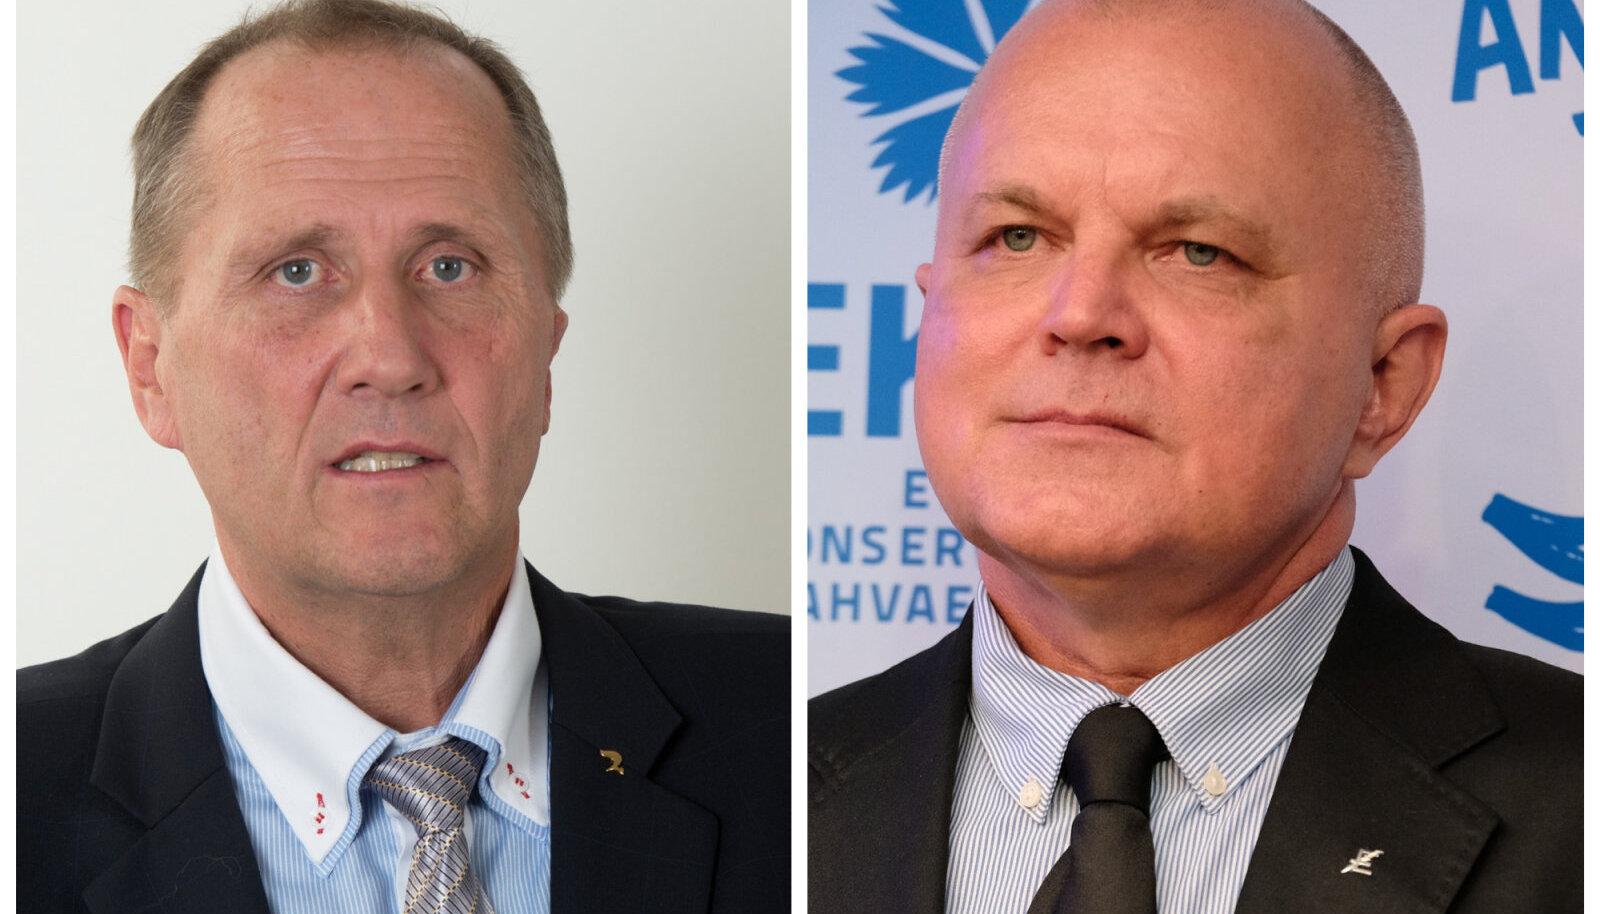 Valdo Randpere ja Urmas Reitelmann